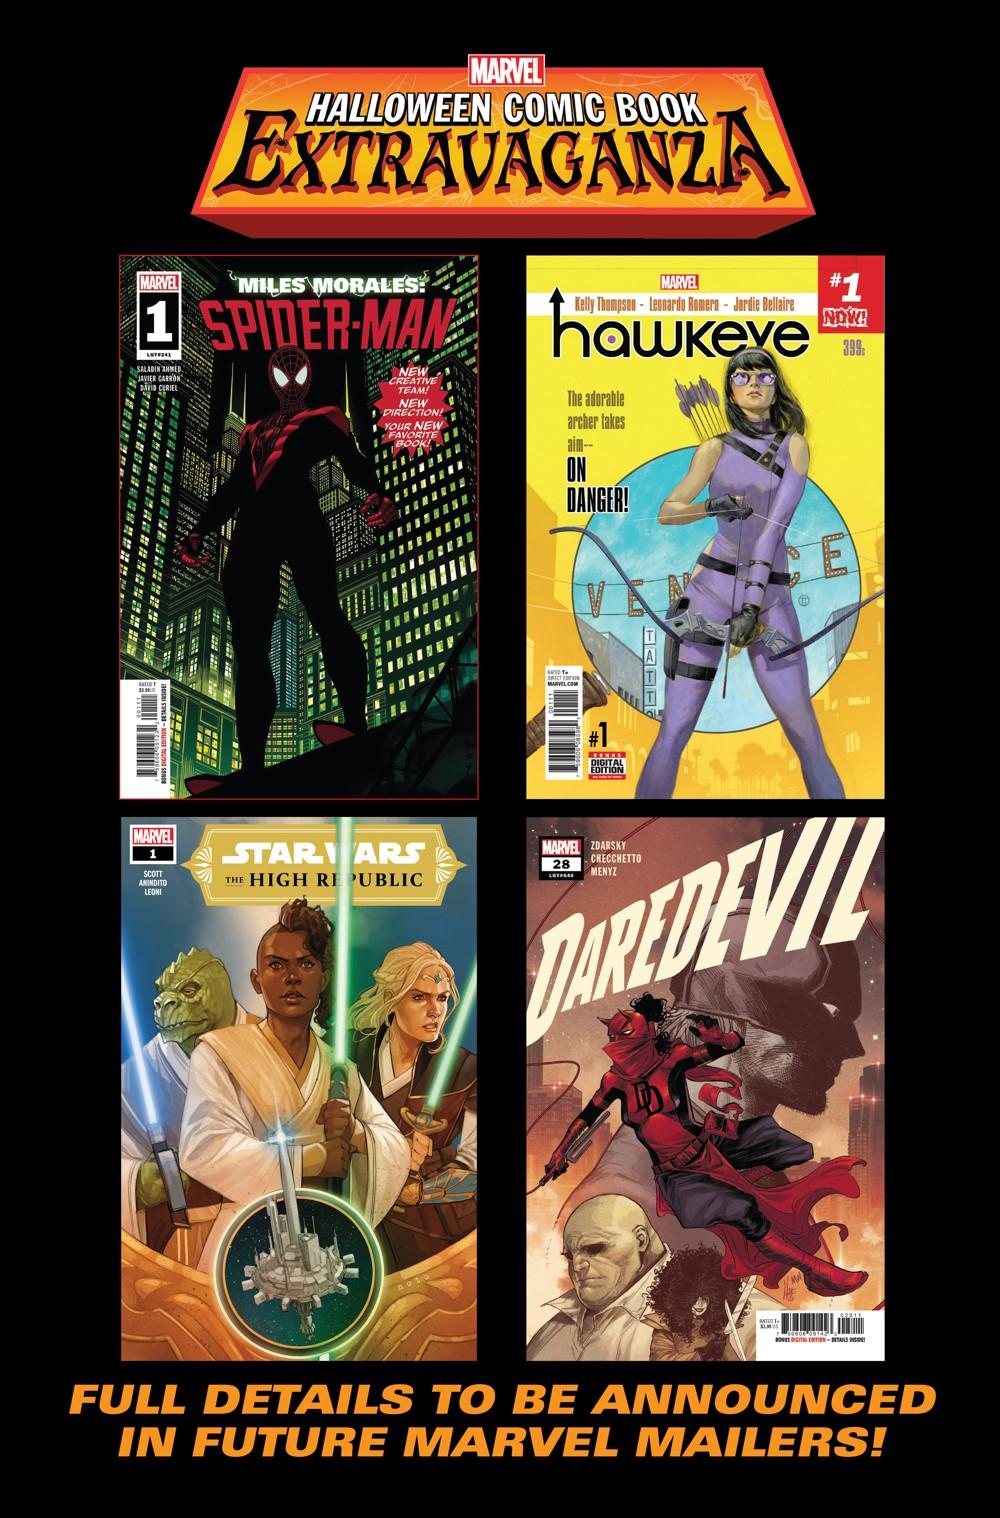 Marvel_Halloween_Extravaganza MARVEL HALLOWEEN COMIC BOOK EXTRAVAGANZA is returning